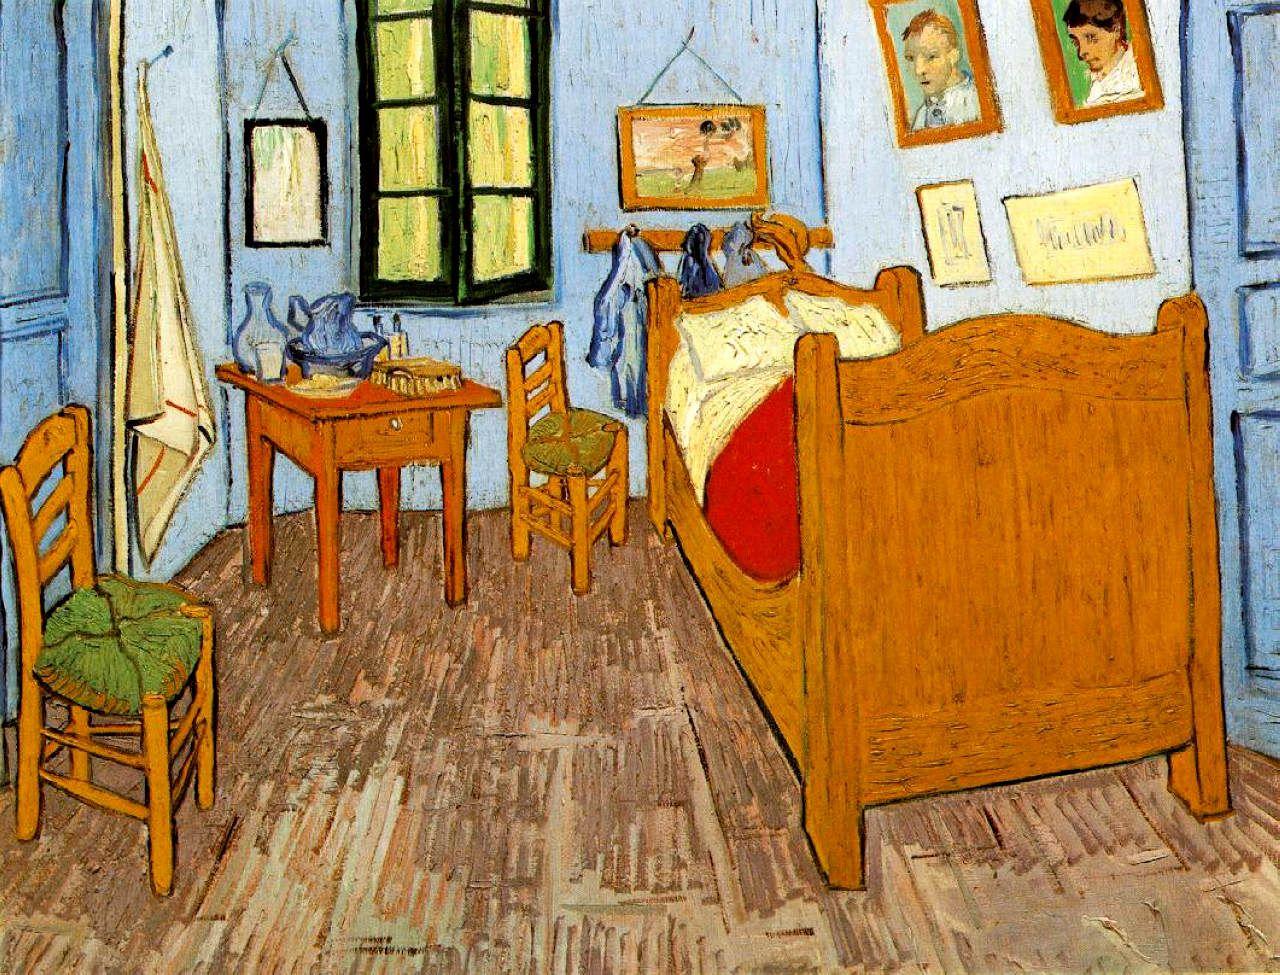 Vincent's Bedroom in Arles (3) Vincent van Gogh